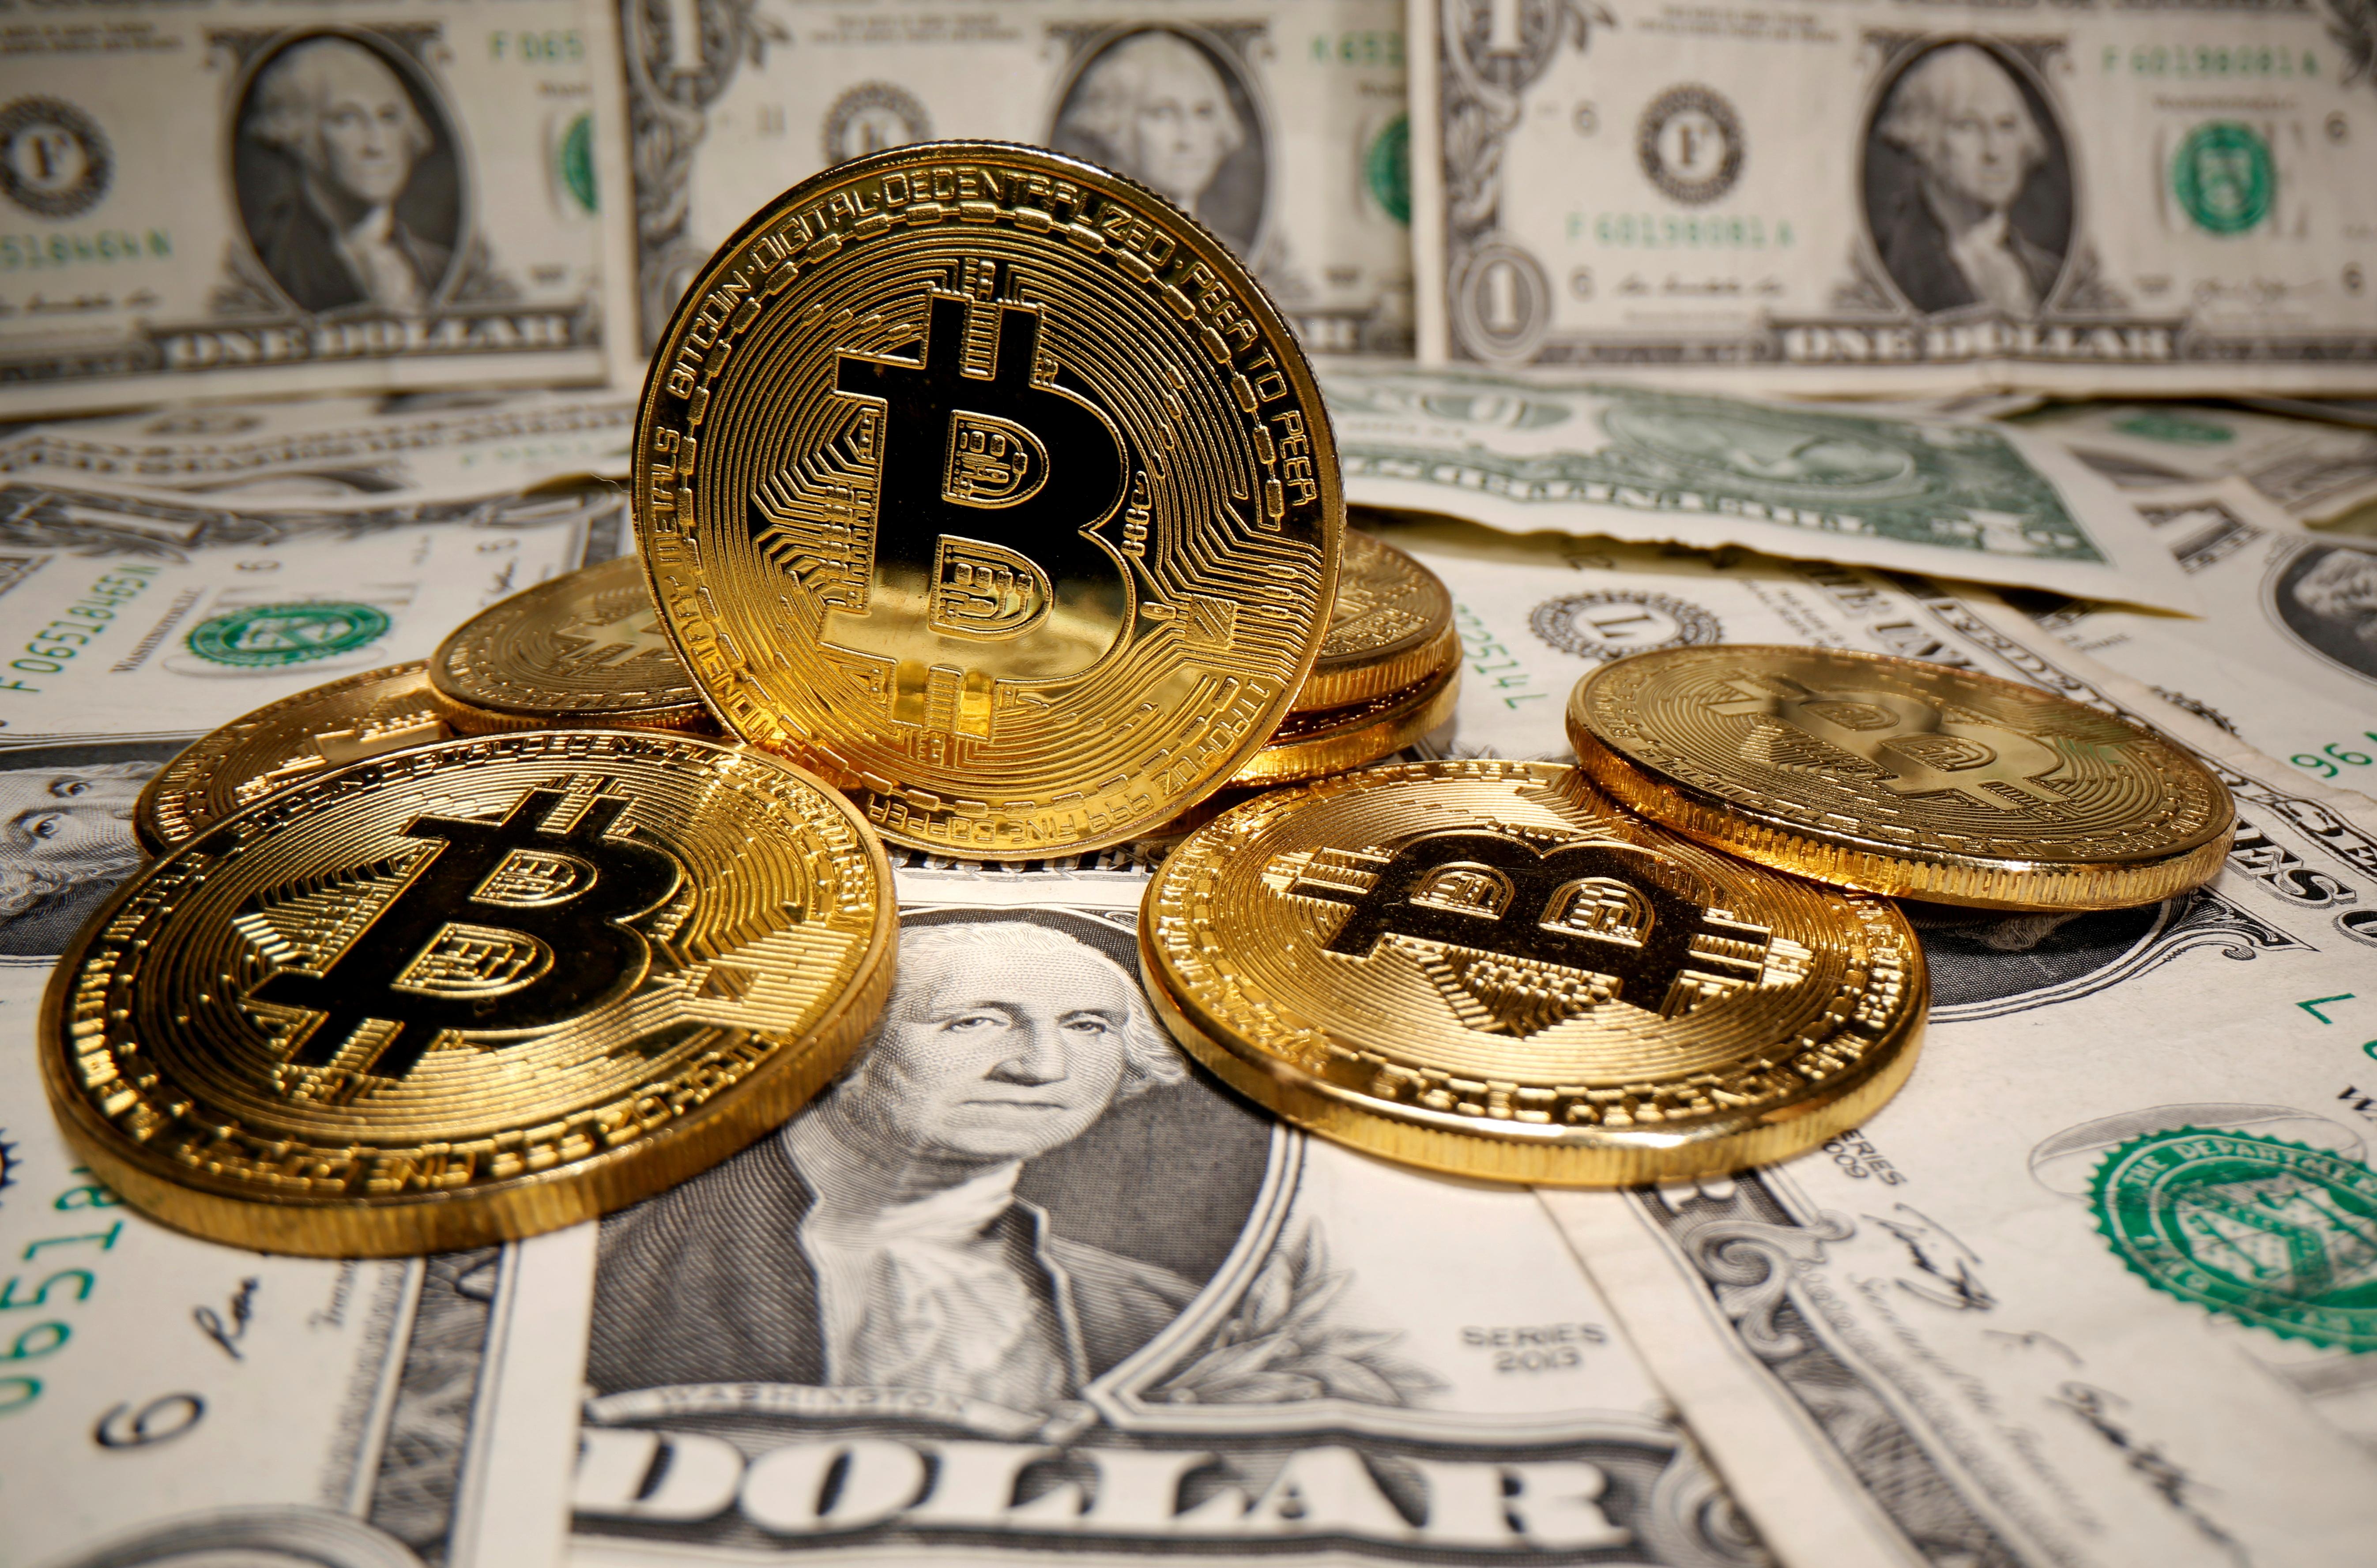 btc bitcoins